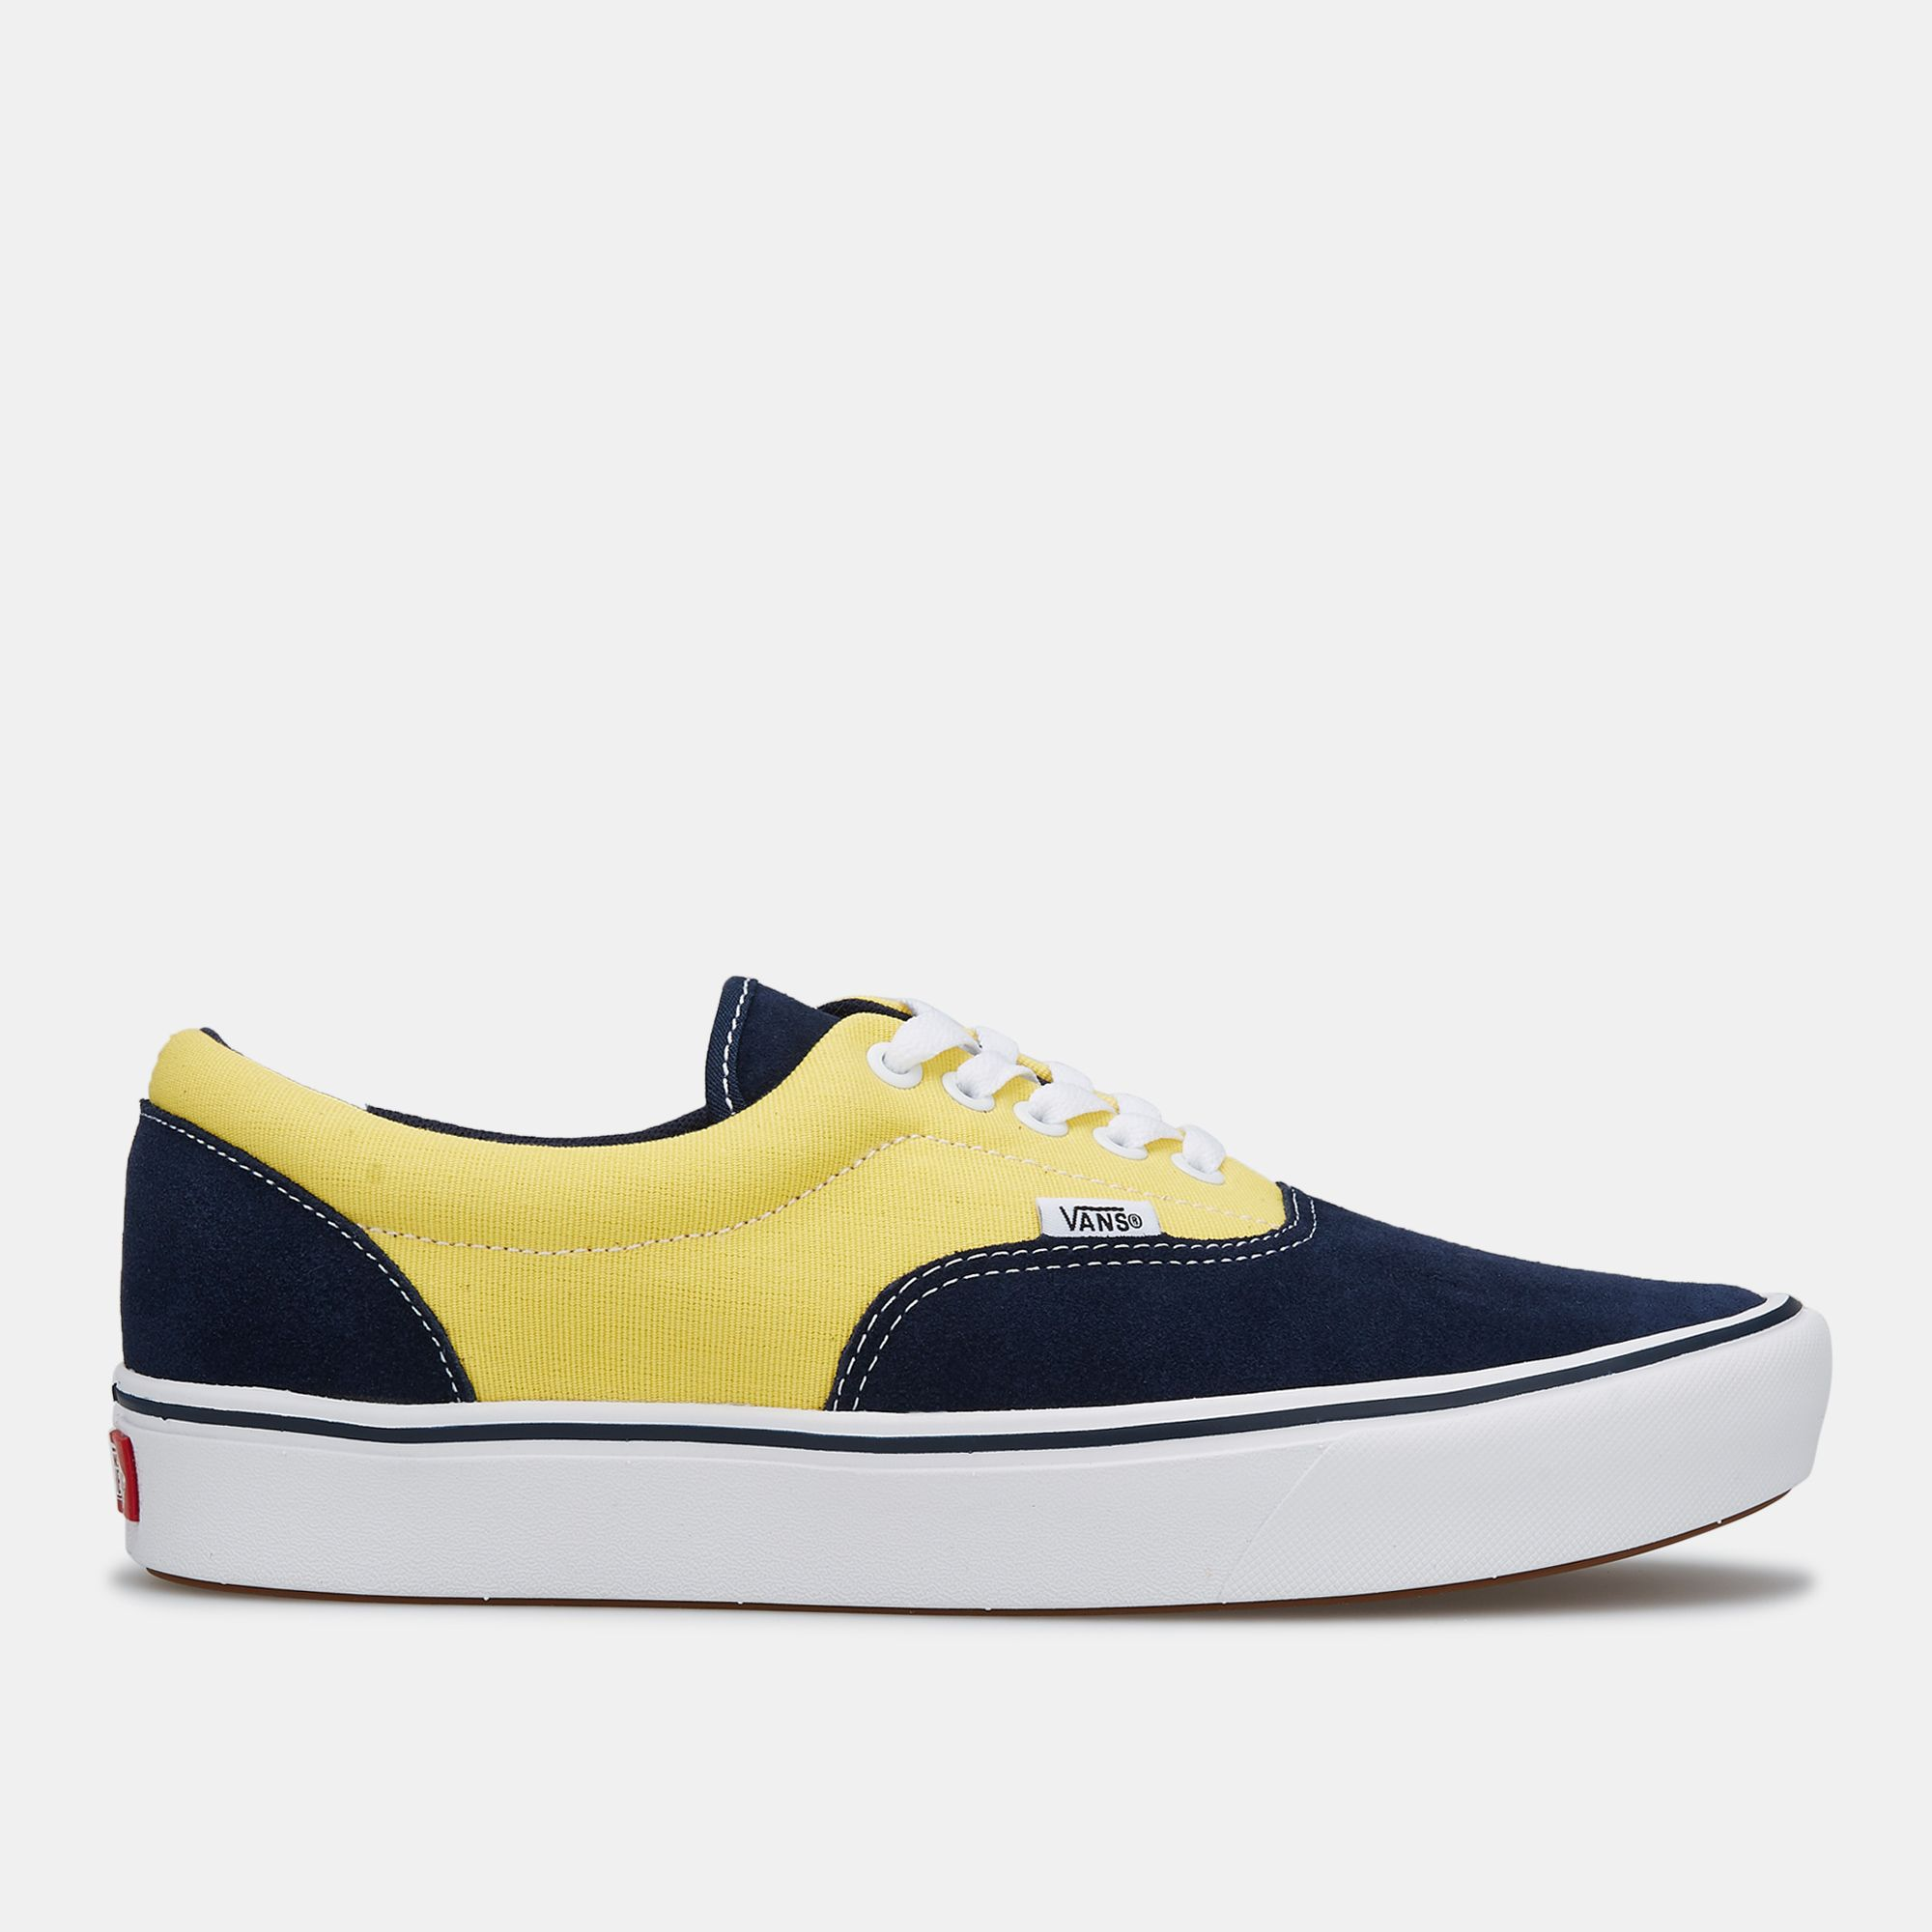 9da1cd53ded1d حذاء كومفي كوش إيرا من فانس